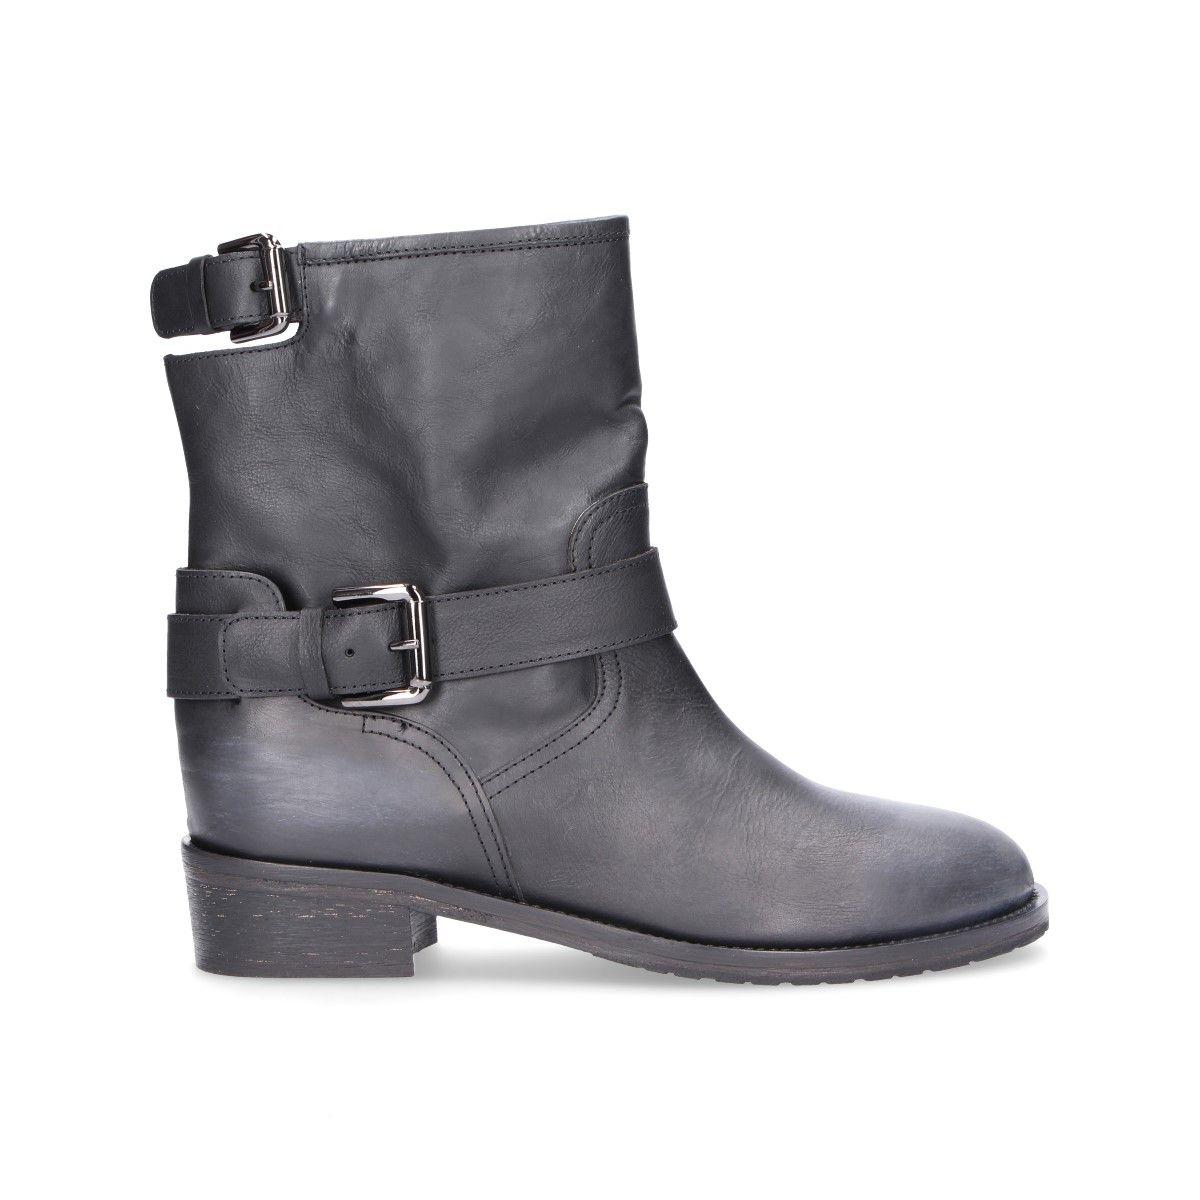 721577a93f Via Roma 15 Women's V2775Black Black Leather Ankle Boots | ModeSens